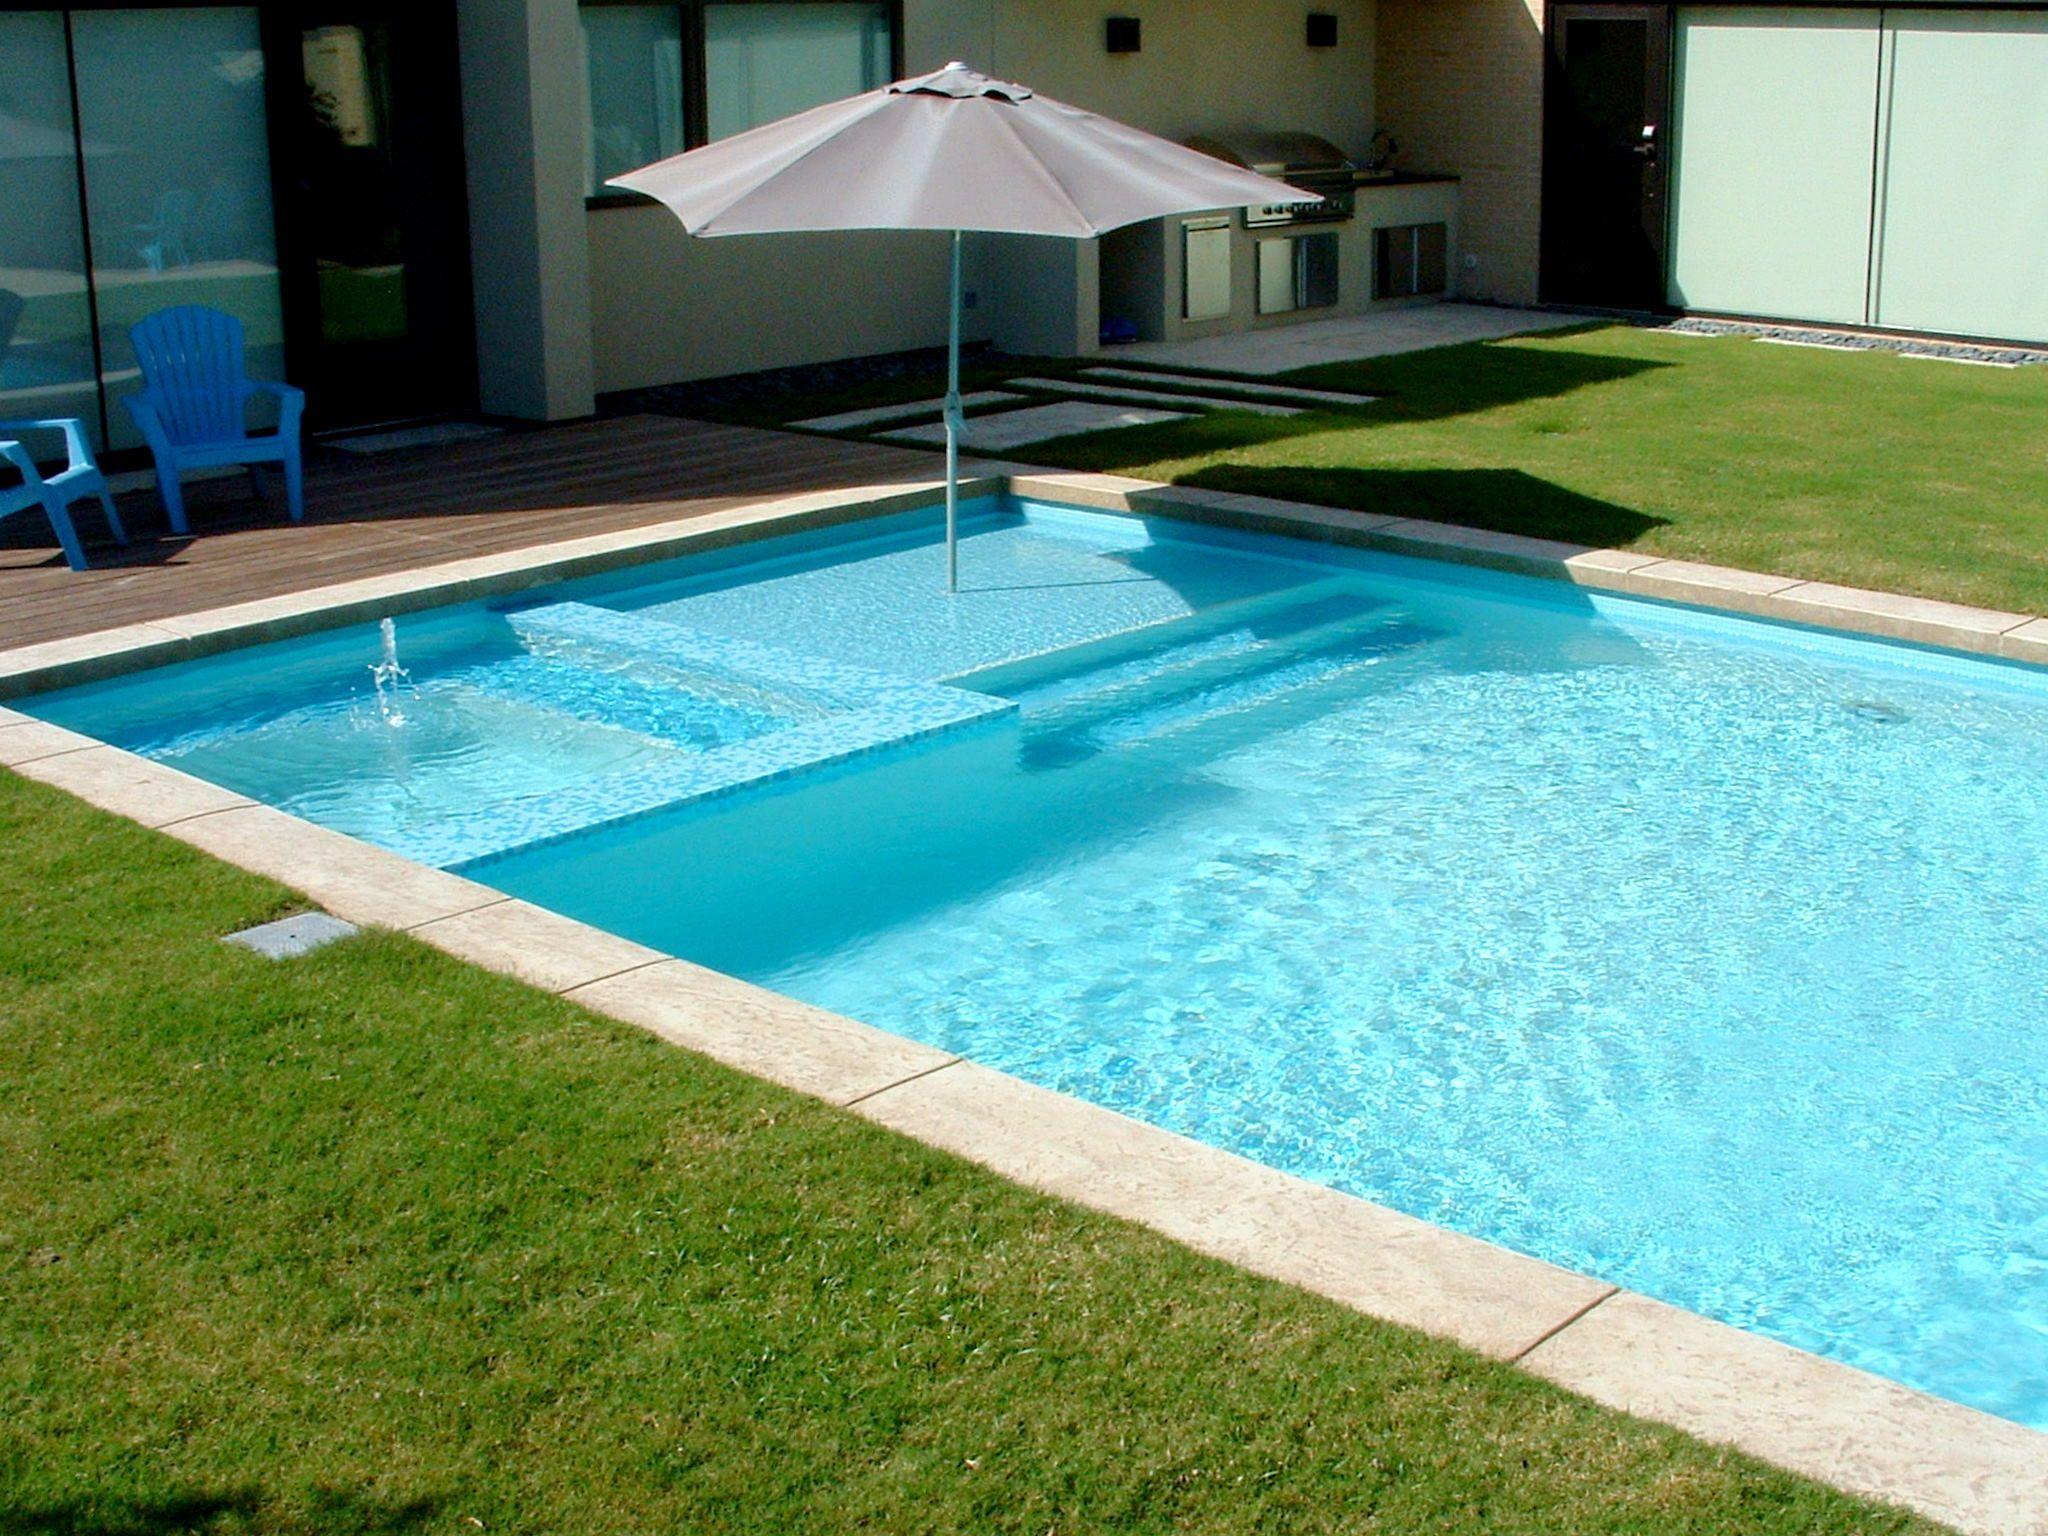 Image result for fiberglass pools baja shelf hot tub for Swimming pool surrounds design